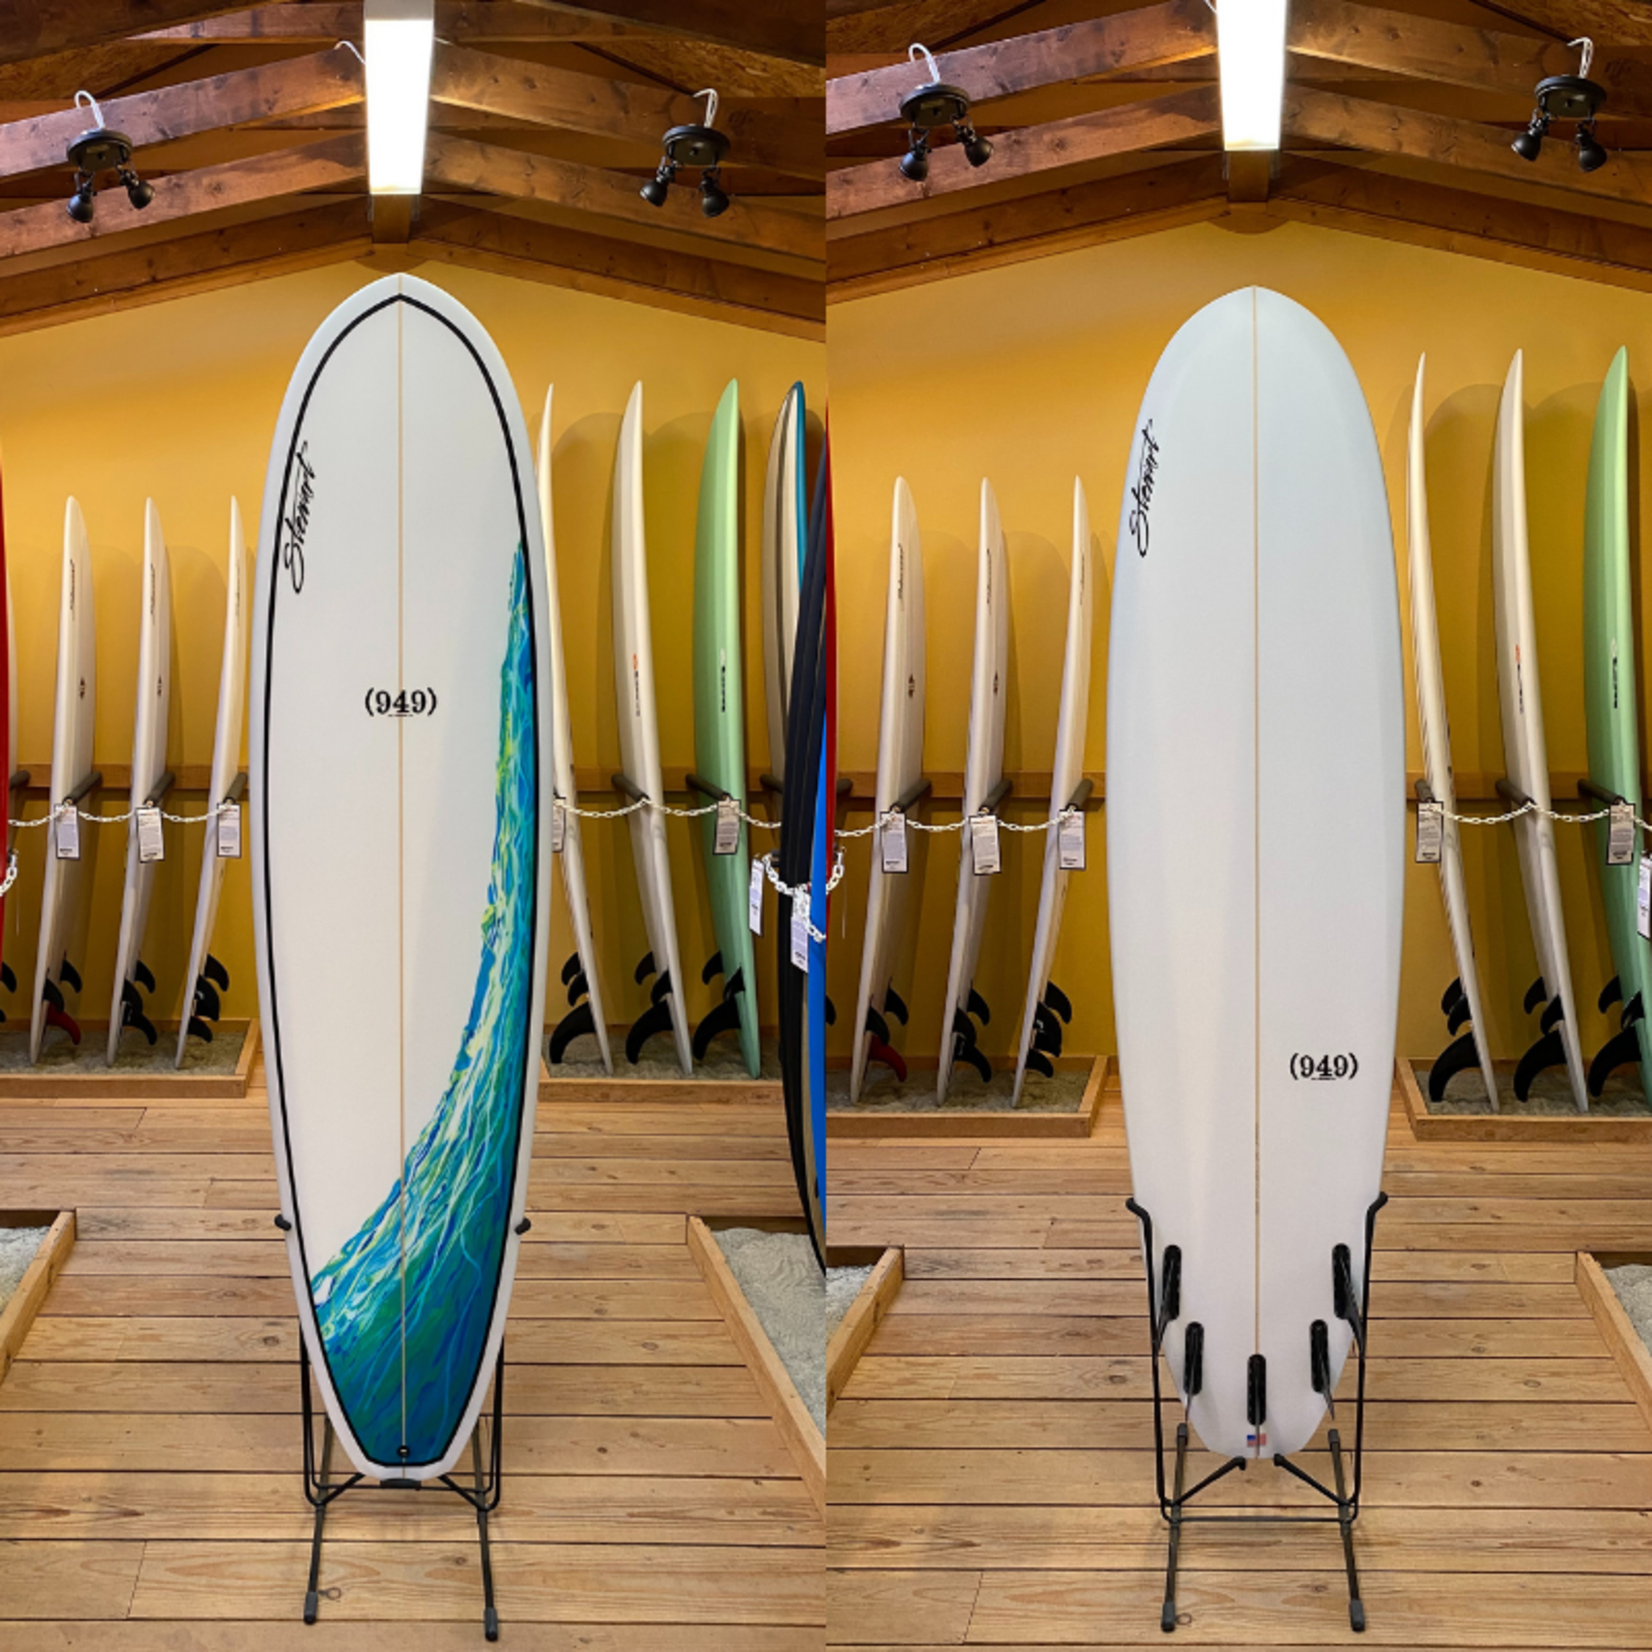 Stewart Surfboards 7'4 Stewart (949) Performance Surfboard #120193*